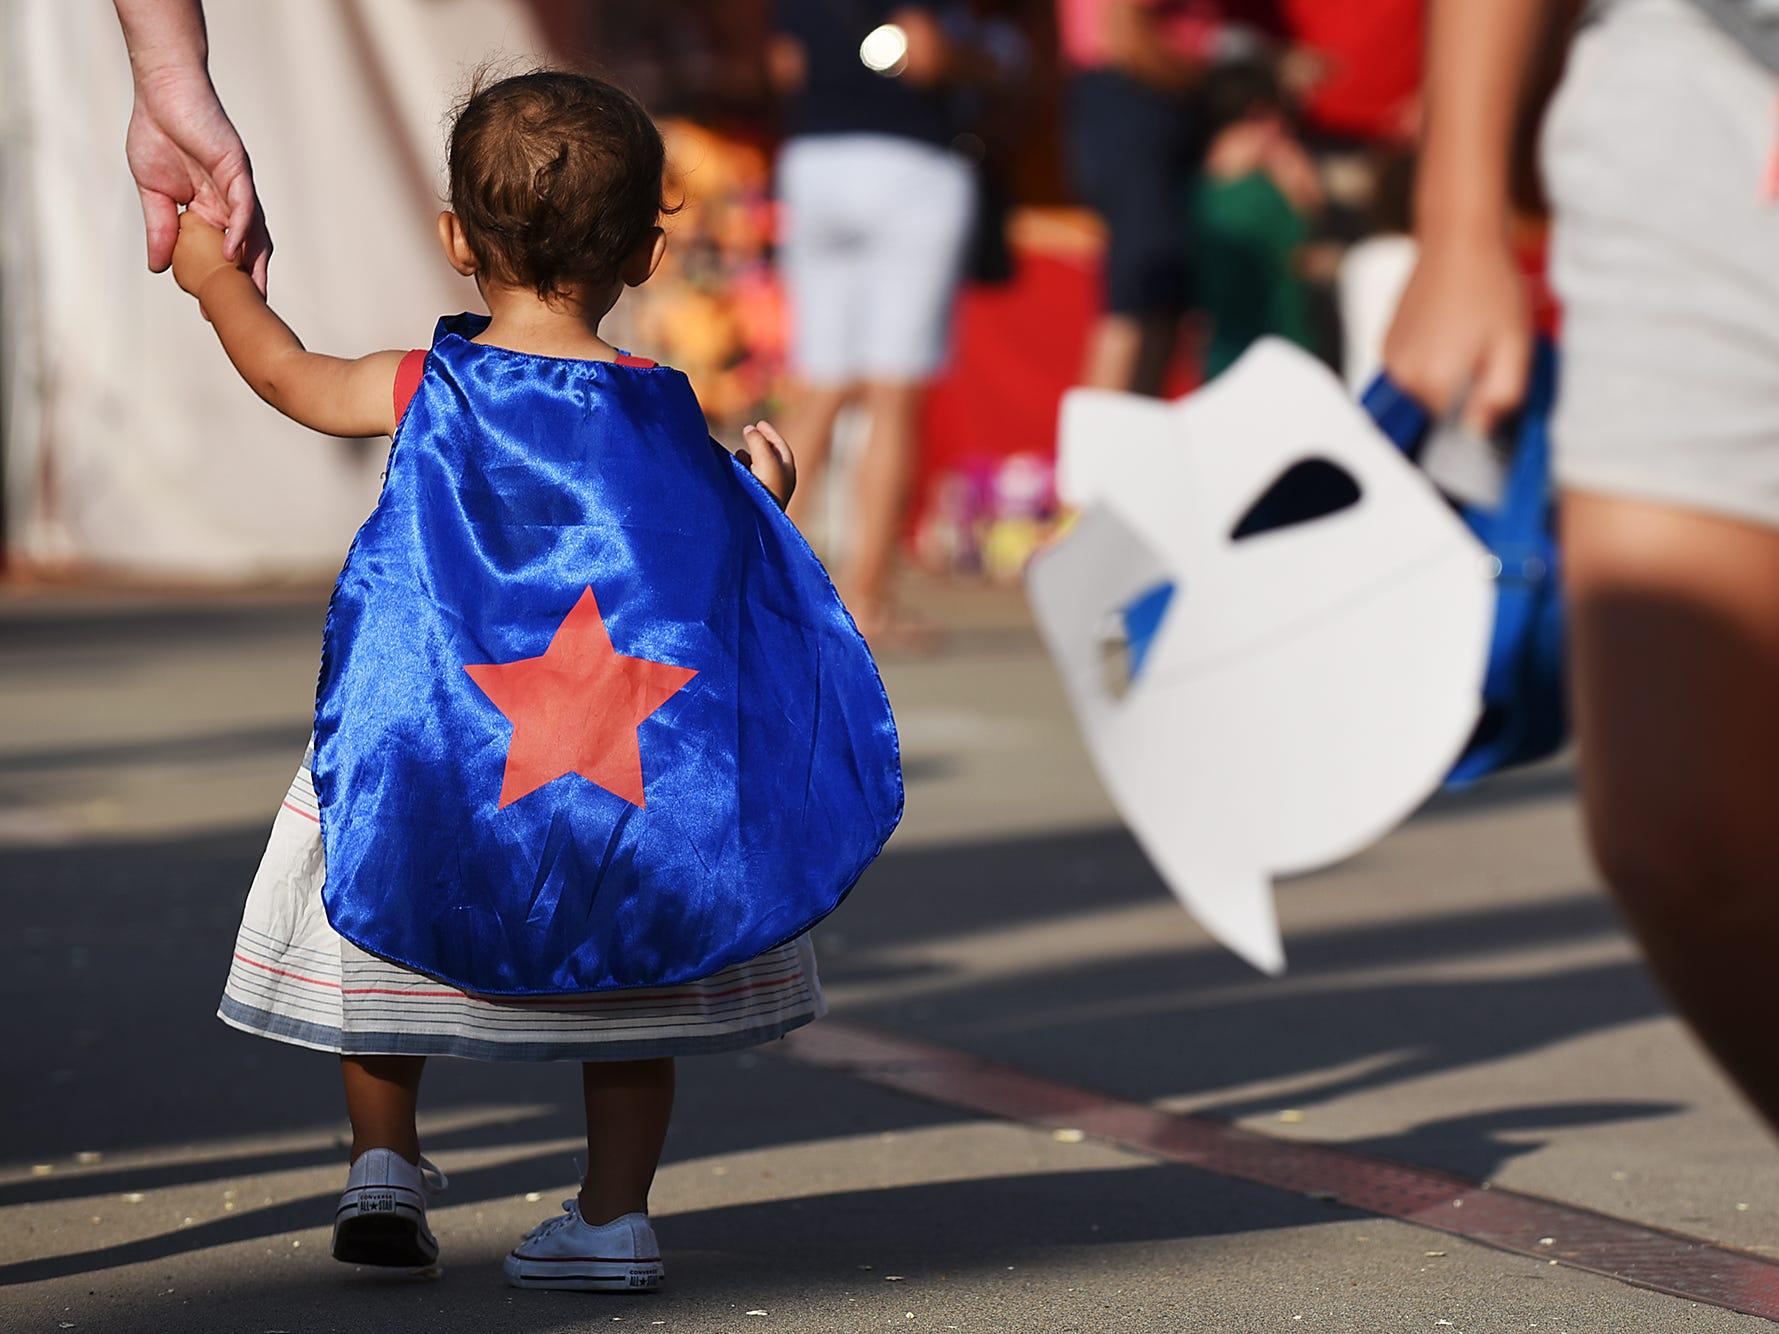 A tiny Superhero participates in Superhero Night at Yogi Berra Stadium in Little Falls  on Saturday July 28, 2018.